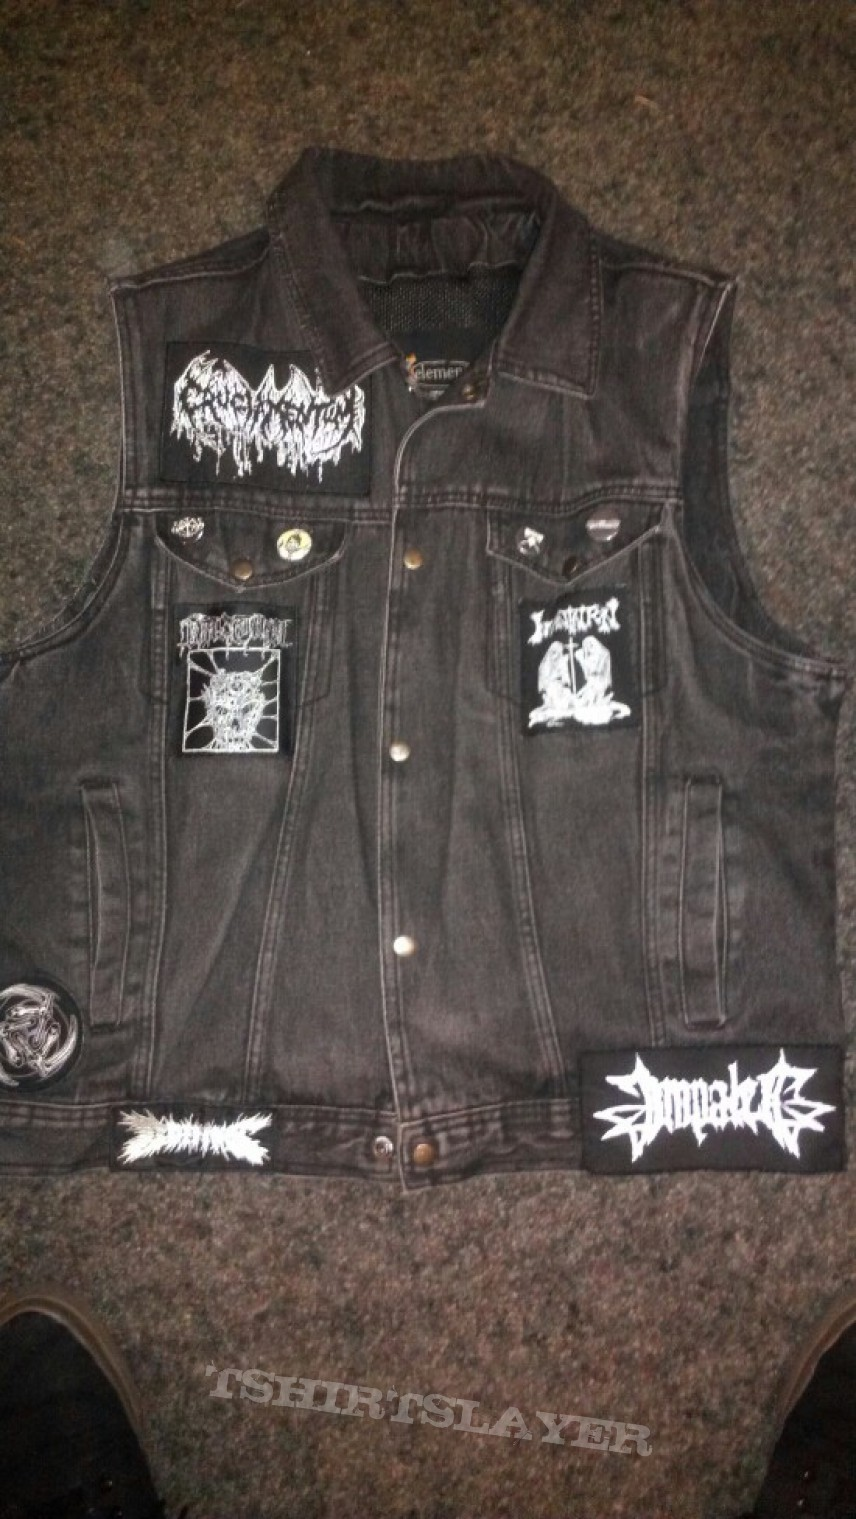 Battle Jacket - My Stormcrow centerpiece Kutte